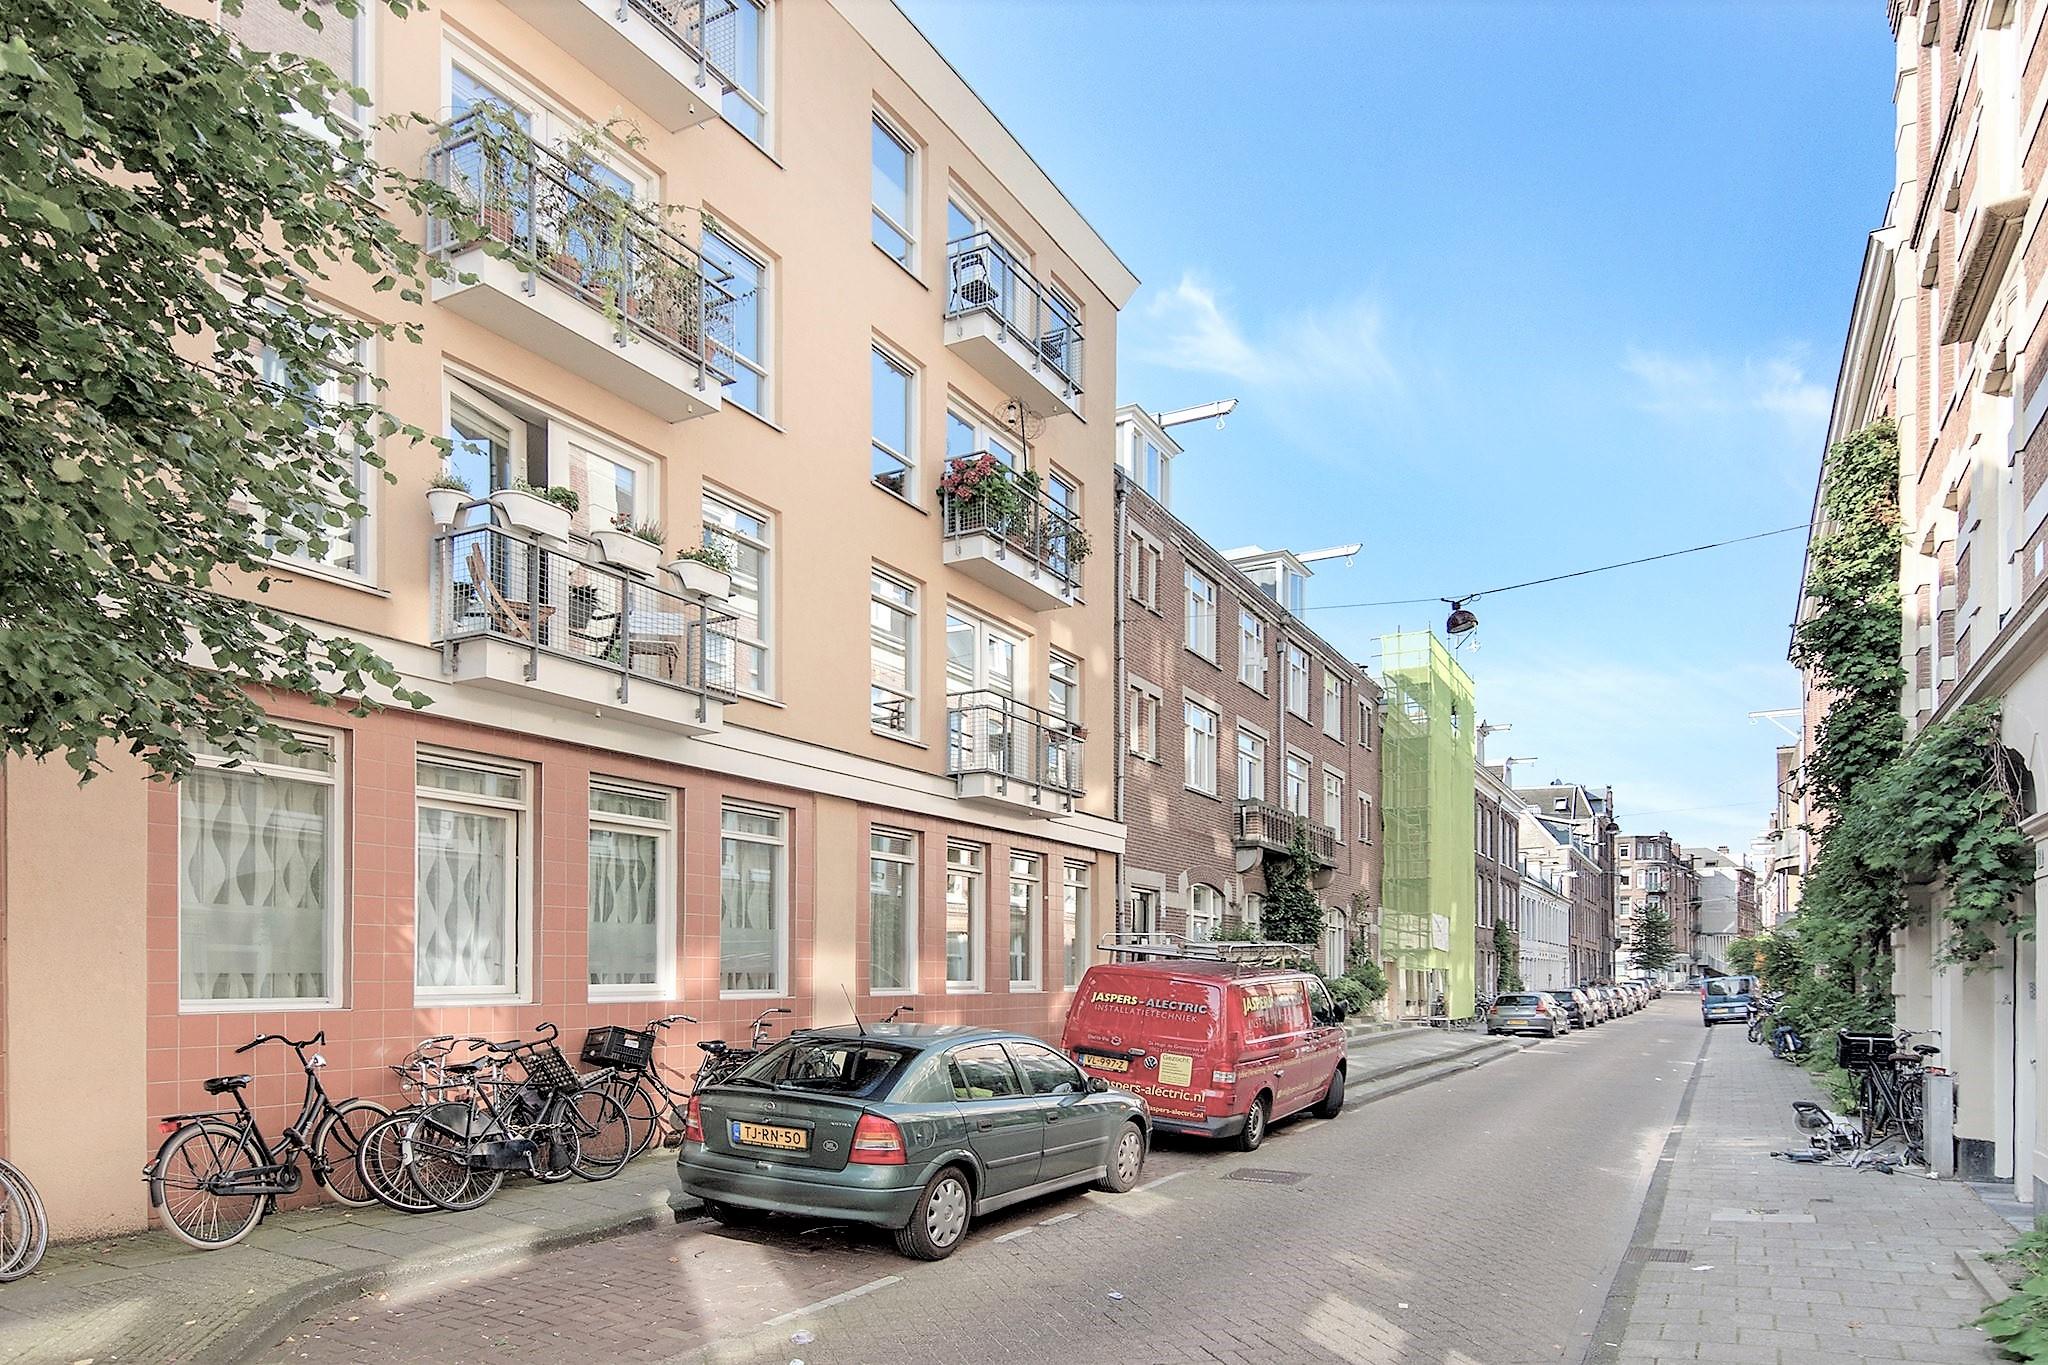 Rustenburgerdwarsstraat, Amsterdam